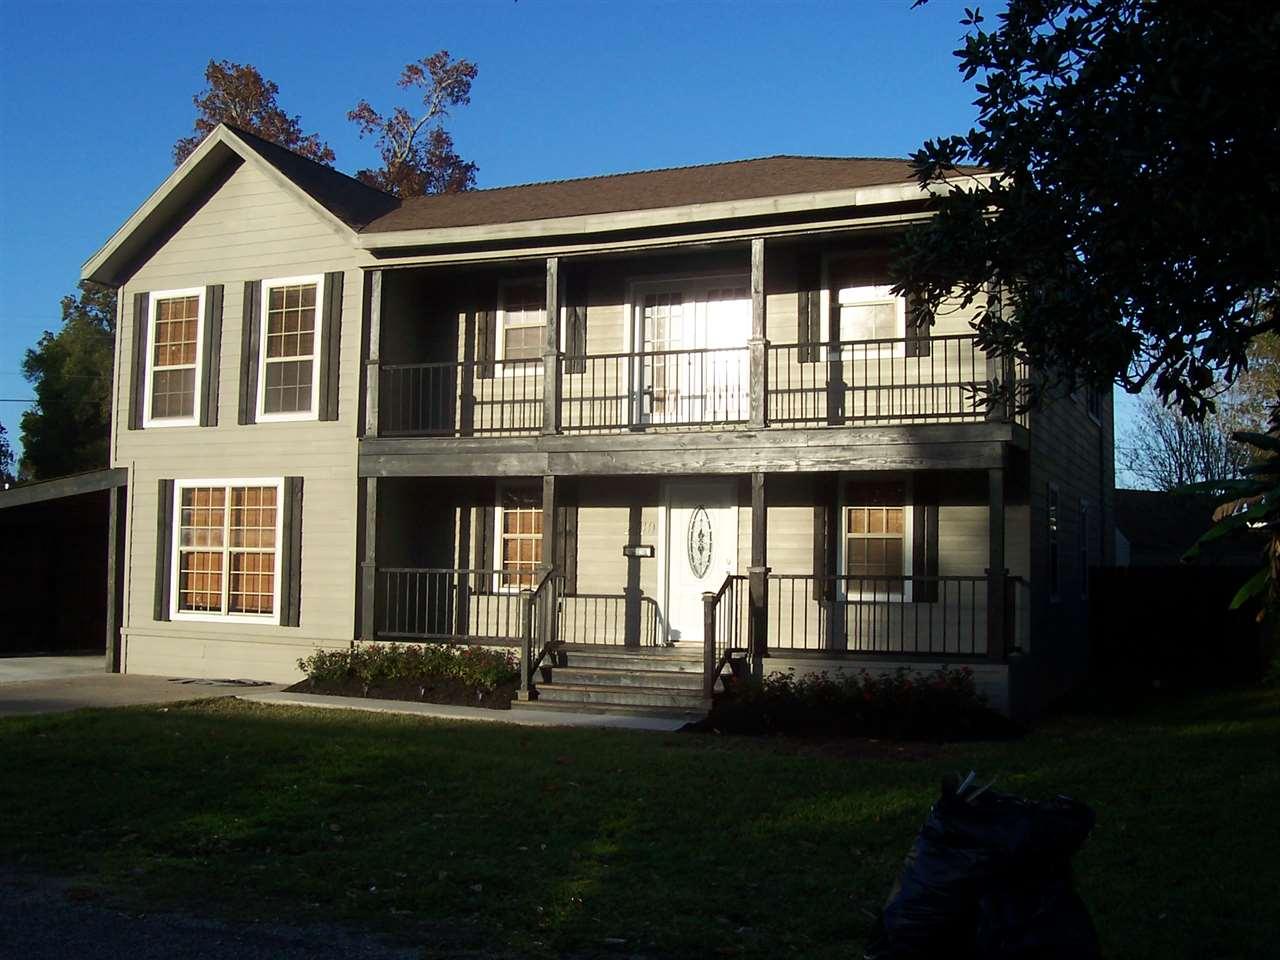 2110 Sun Ave, Port Neches, TX 77651